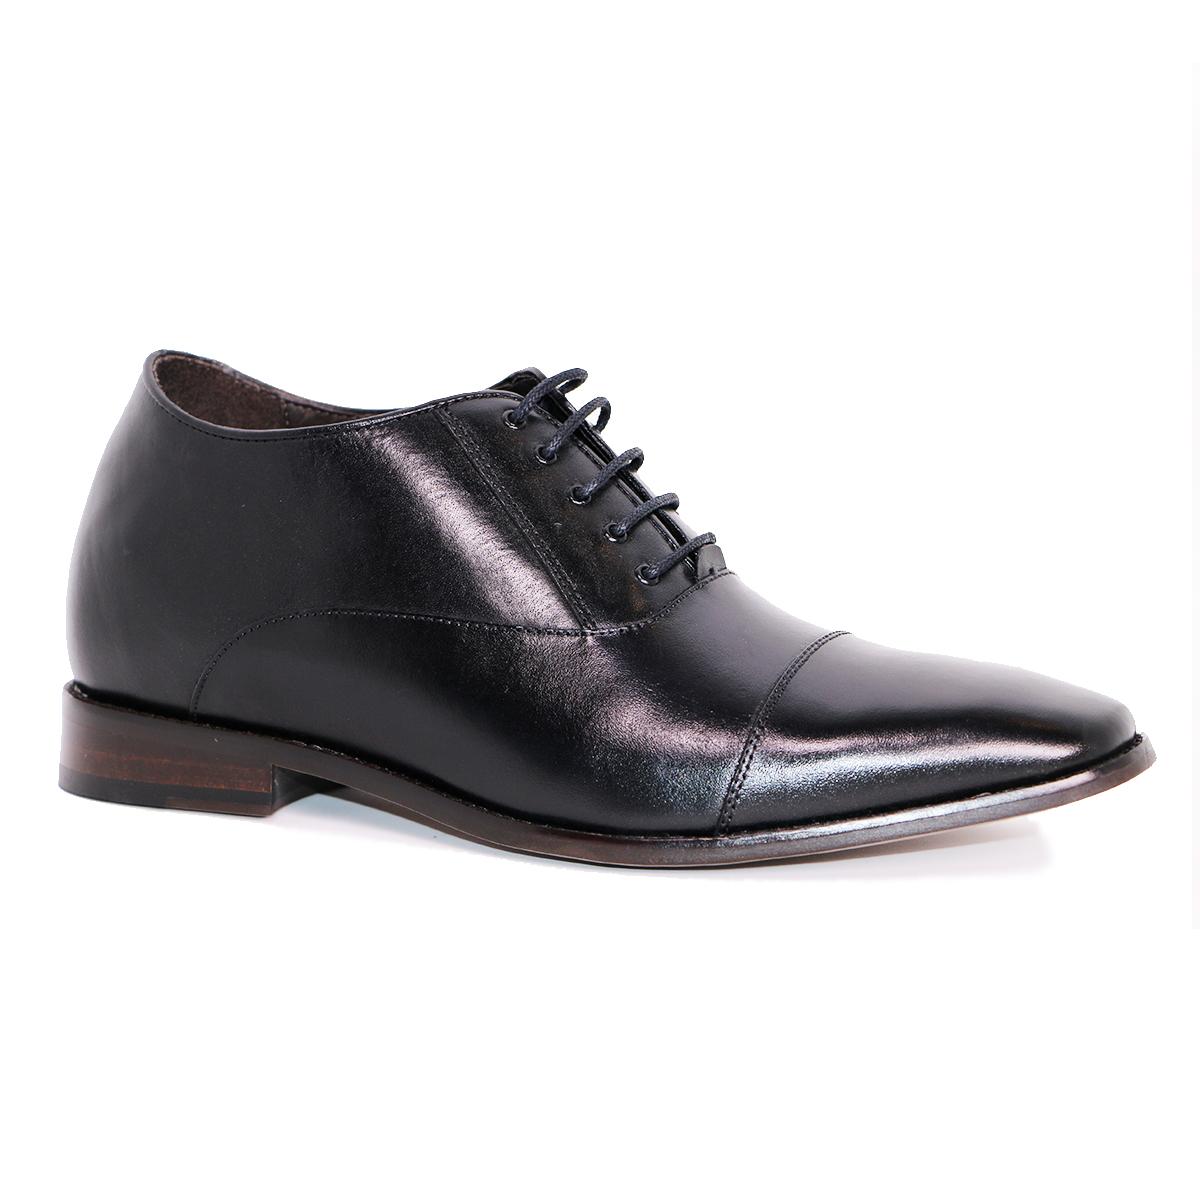 Zapato Formal Director Negro Max Denegri +7cms de Altura